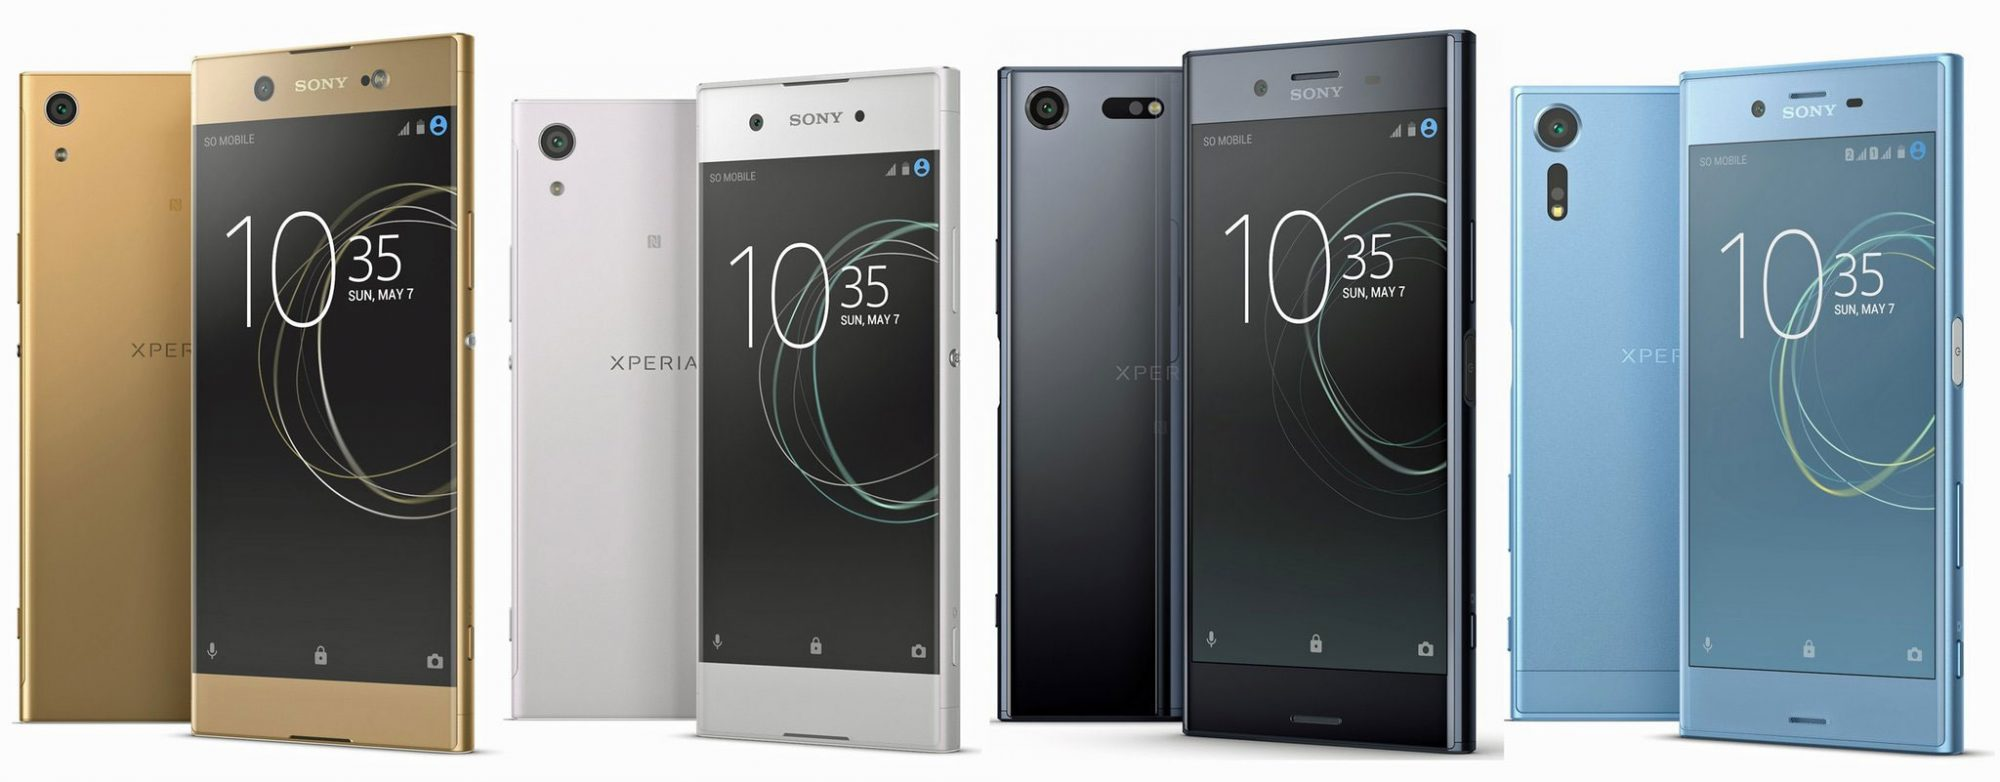 Sony Xperia 2017